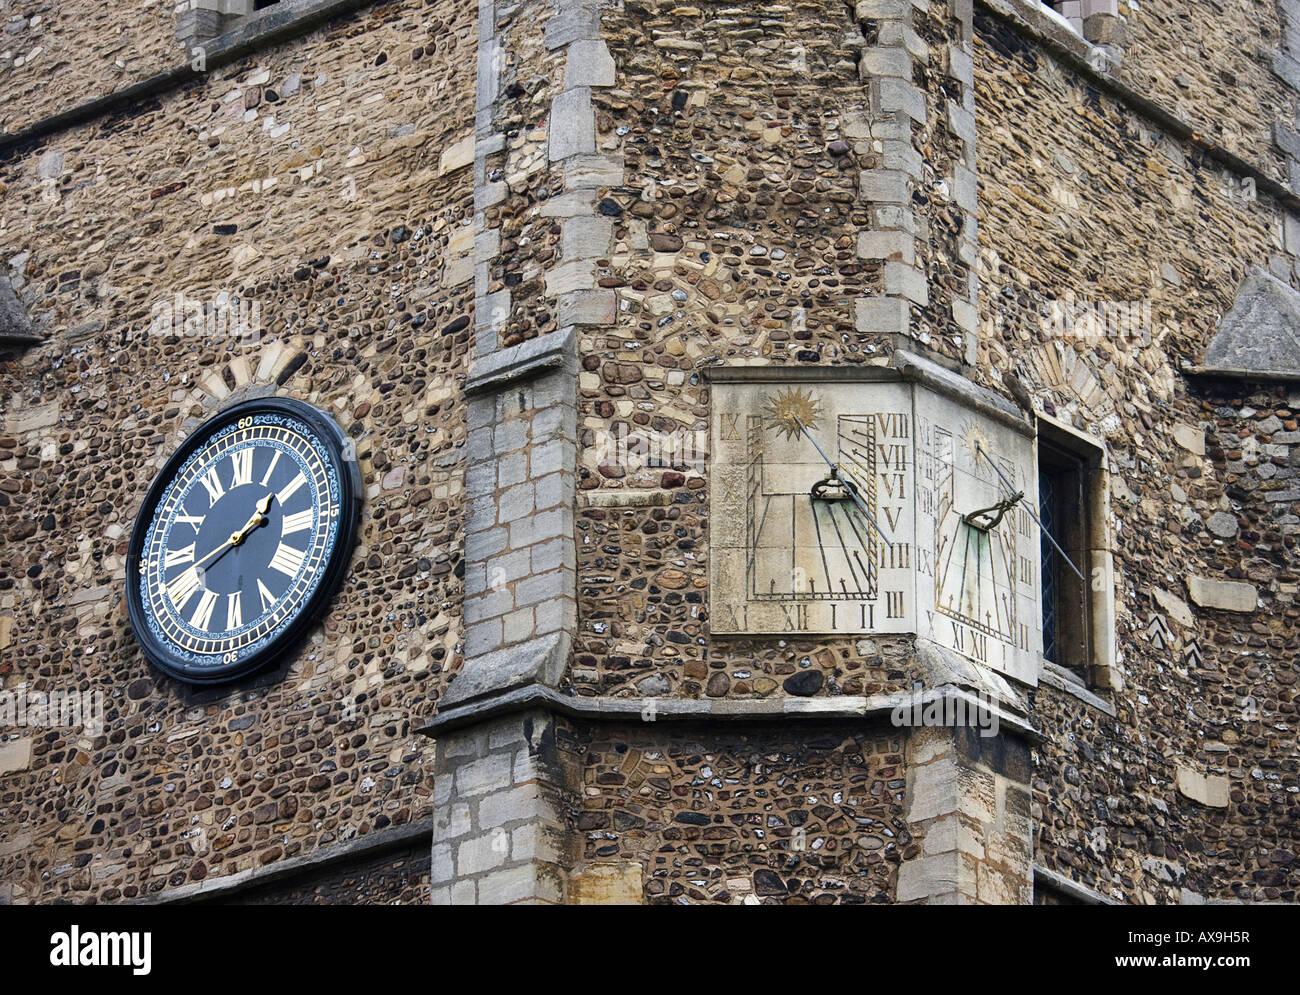 ST BOTOLPH'S CHURCH, in Trumpington Street. sundial. Cambridge. Cambridgeshire. East Anglia. UK. - Stock Image